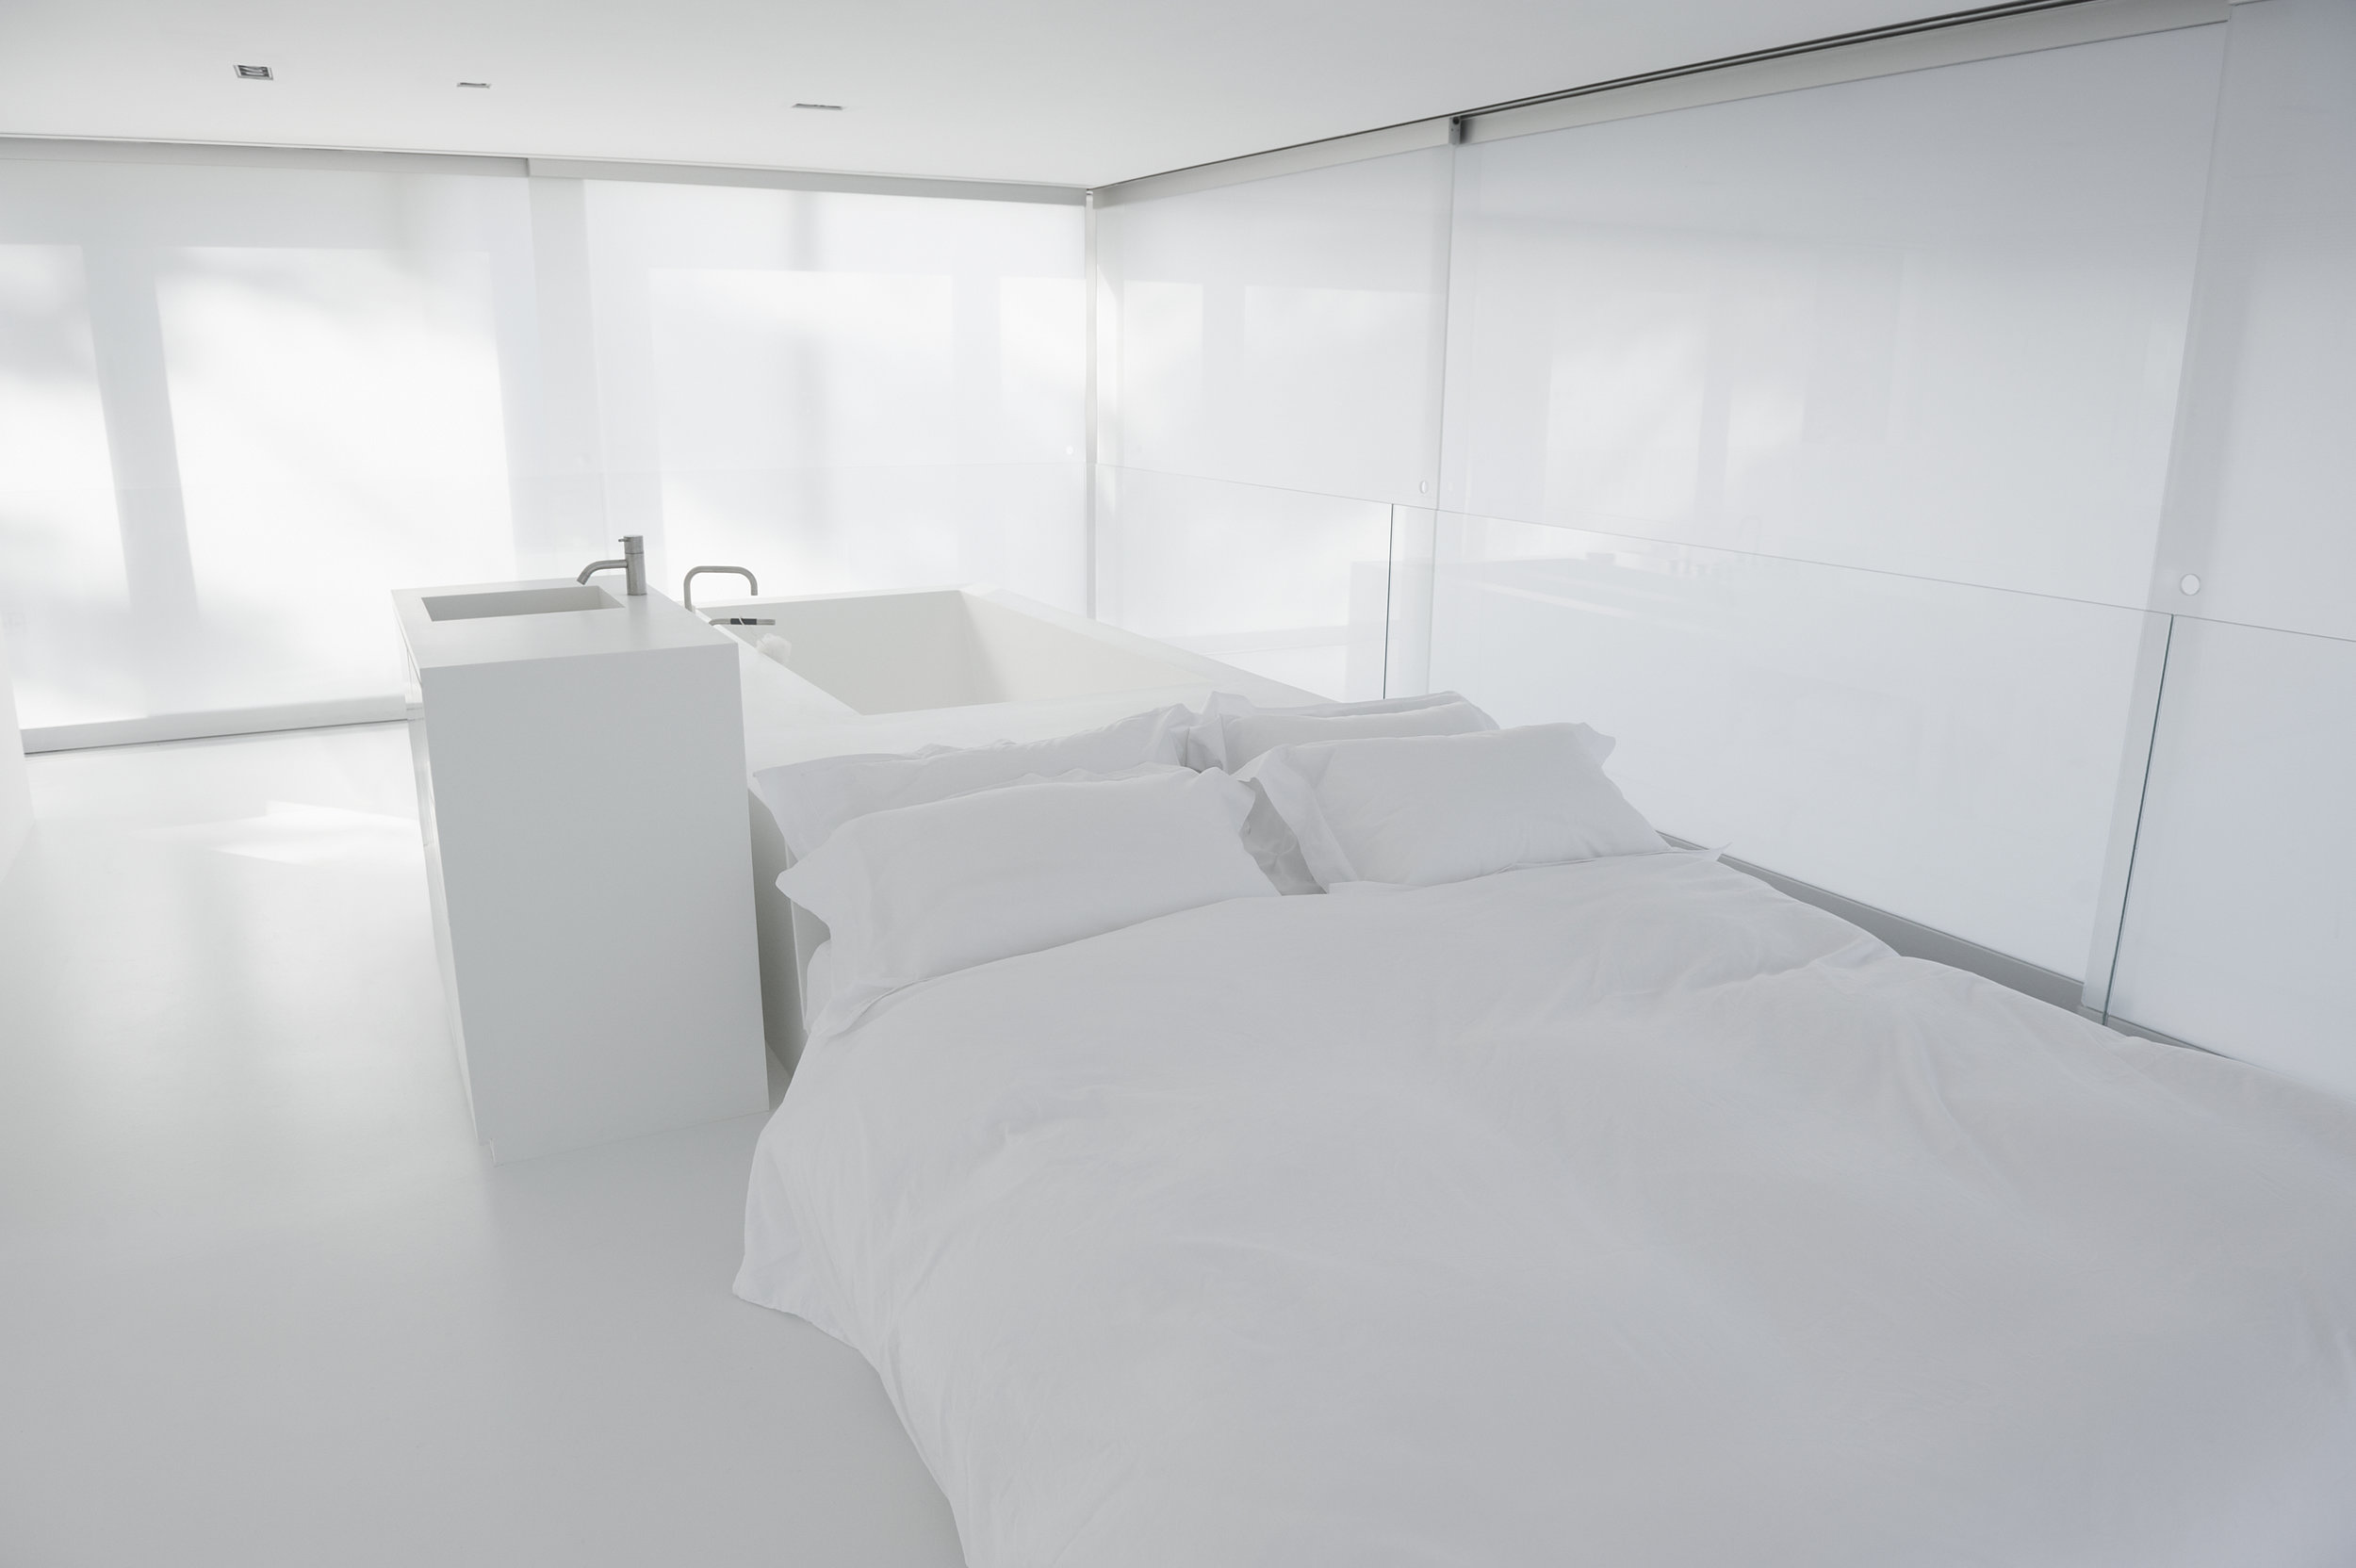 gh3-boathouse-bedroom-shutters closed.jpg